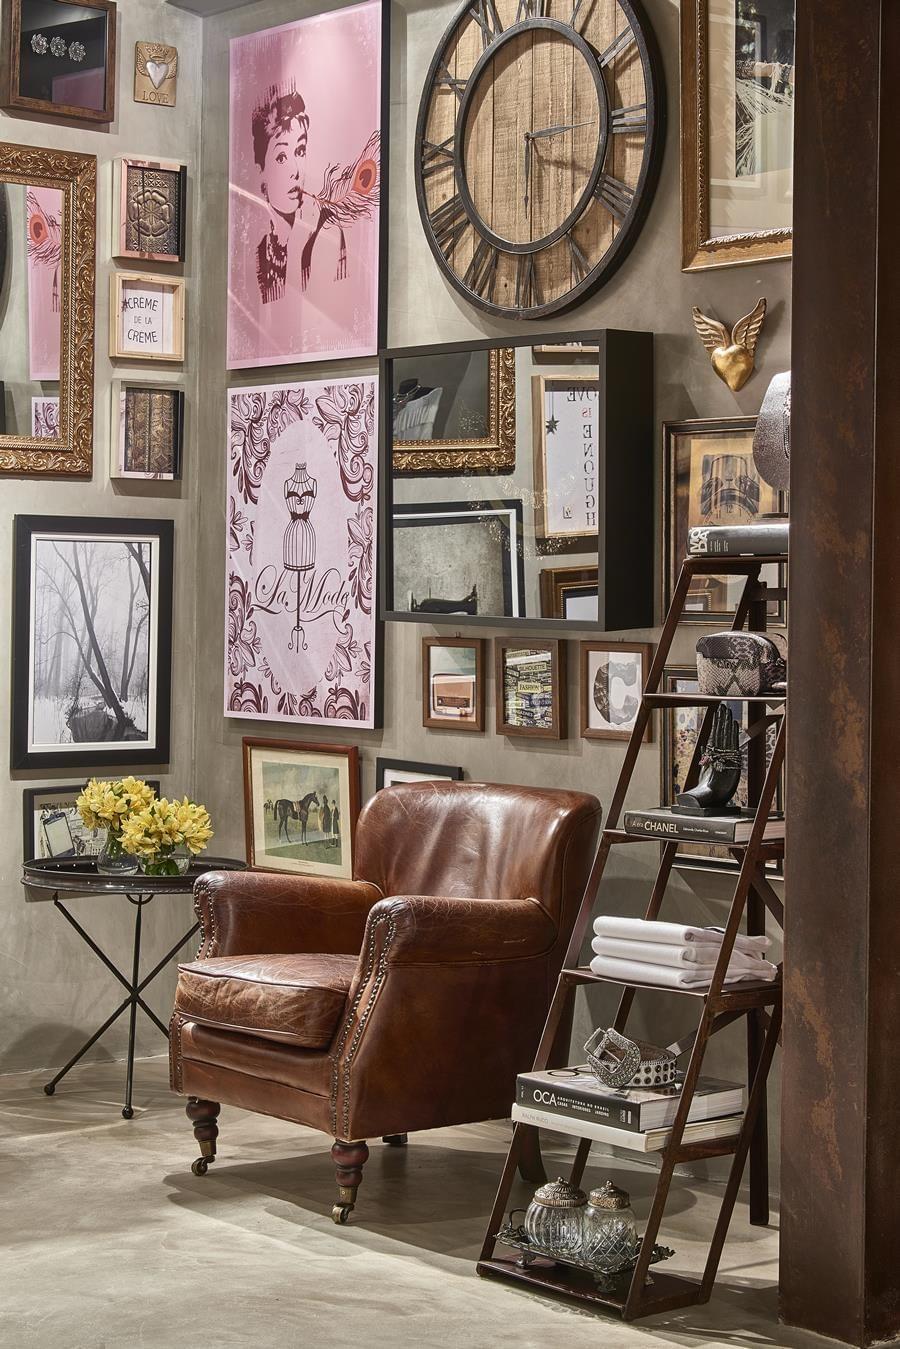 Showroom caos galeria da arquitetura chale vida pinterest